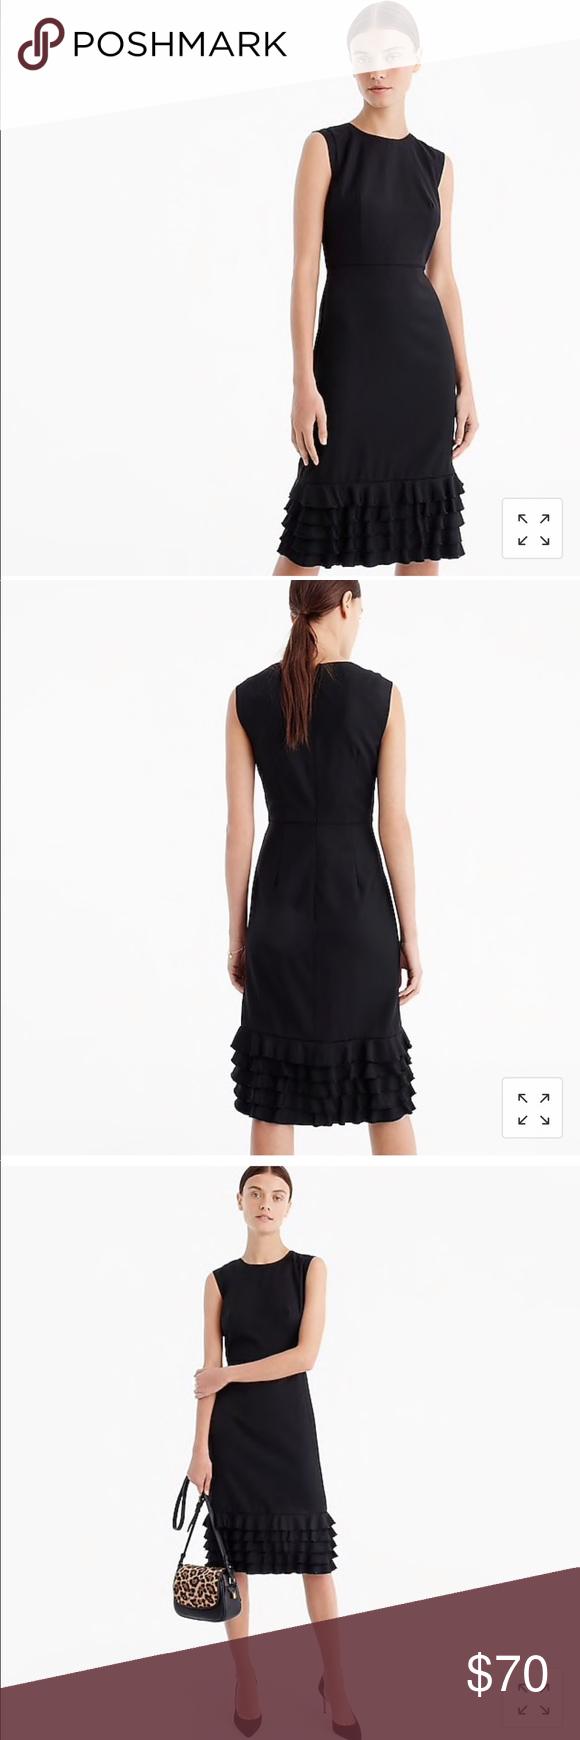 Nwot J Crew Suiting Wool Ruffle Hem Sheath Dress Suiting Dresses Sheath Dress [ 1740 x 580 Pixel ]